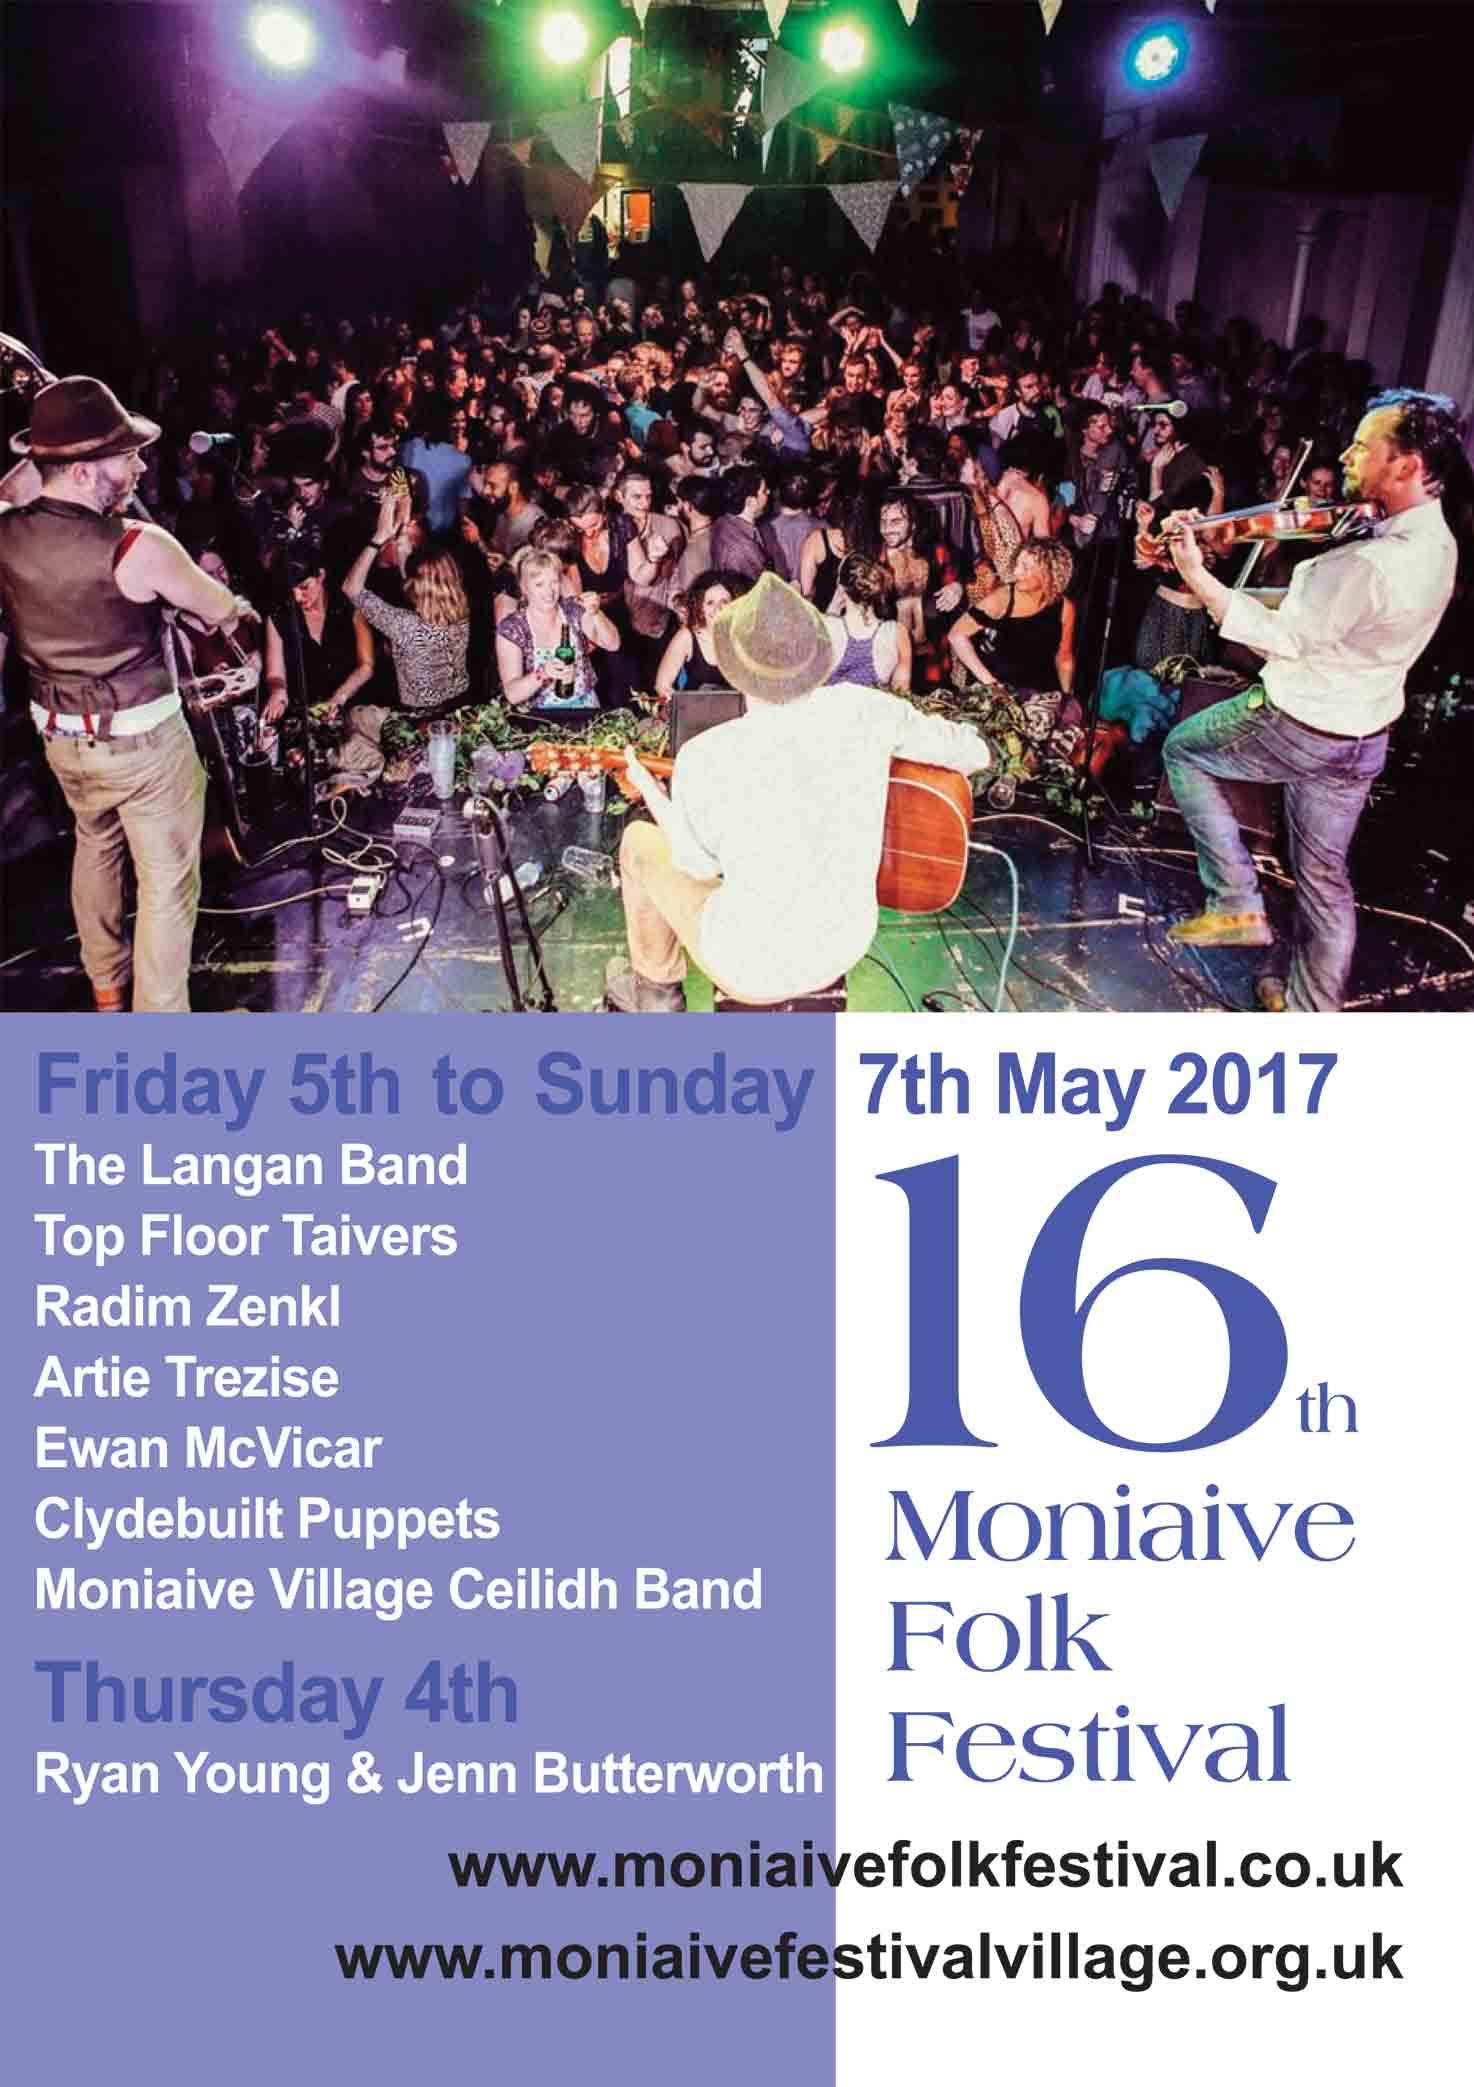 Moniaive Folk Festival 2017